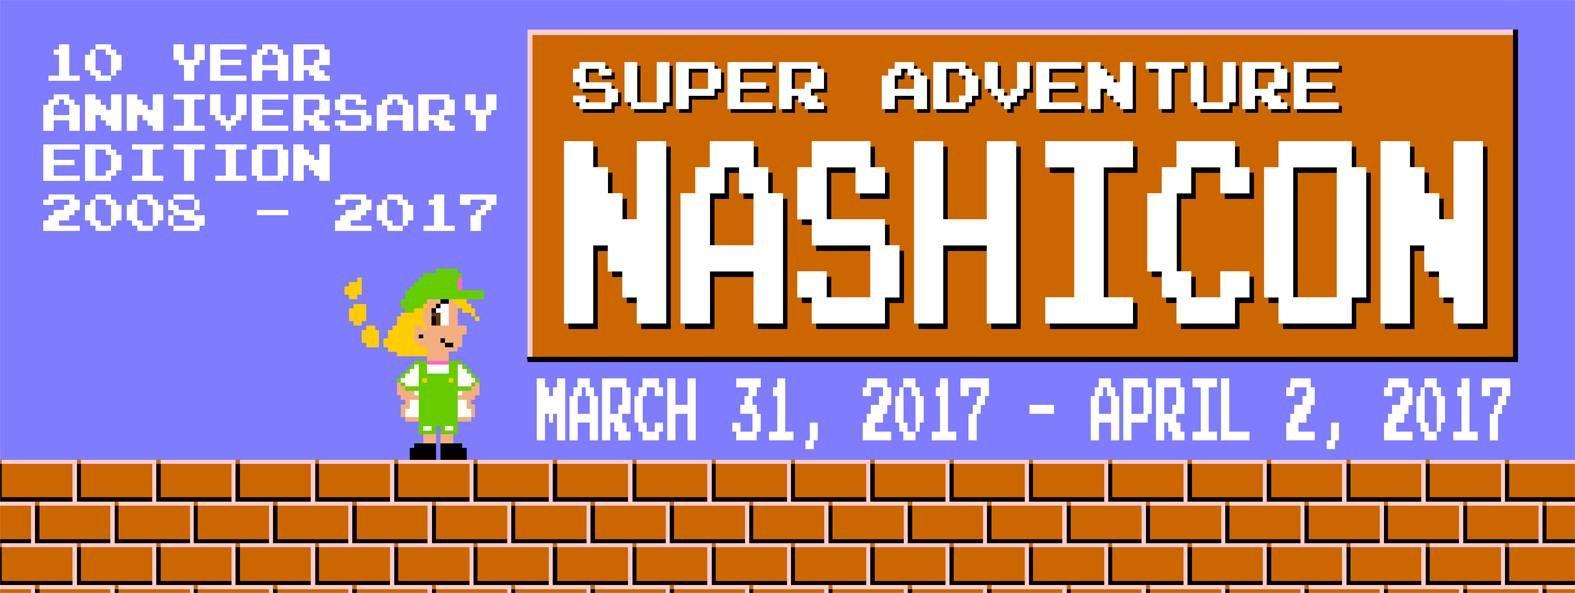 NashiCon 2017 - Columbia, SC, USA, March 31 - April 2, 2017